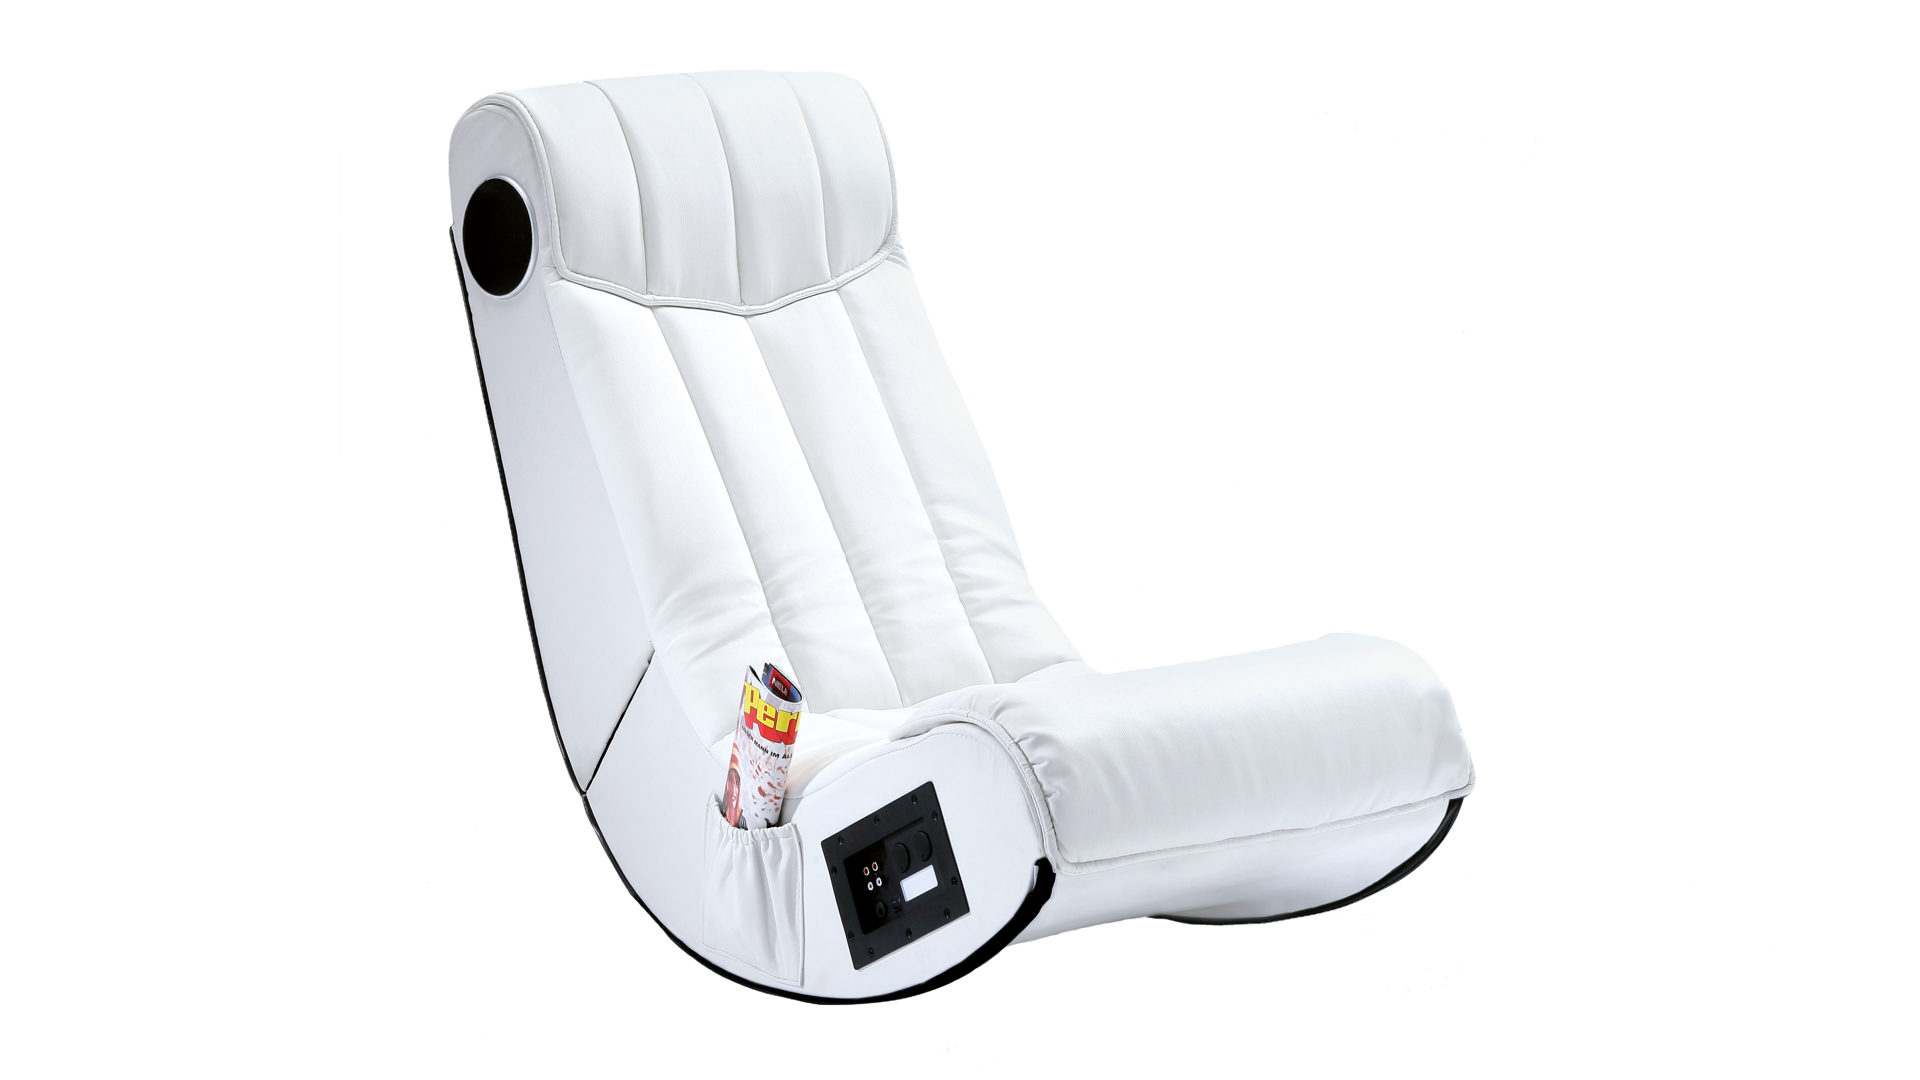 Sessel Zum Liegen trendwerk by möbel busch bestellbar sitzsäcke sessel